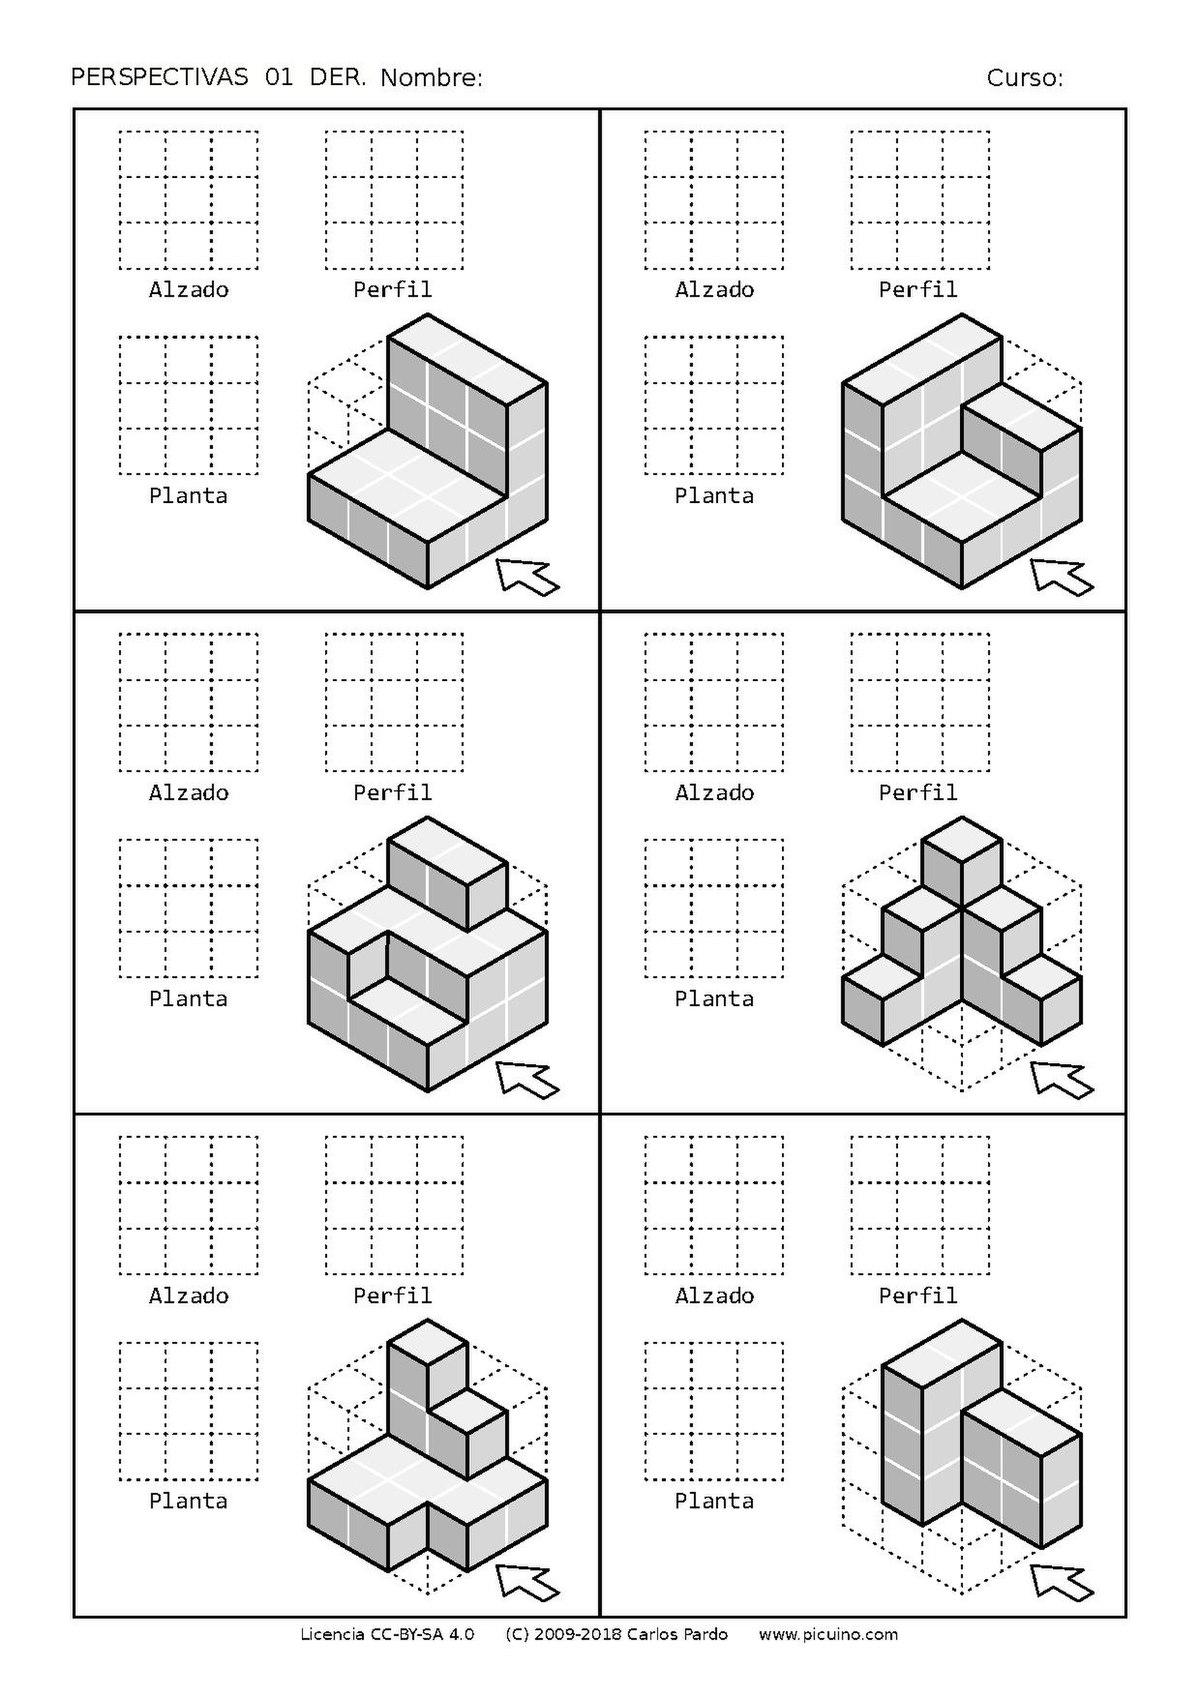 File:Vistas-der-01.pdf - Wikimedia Commons